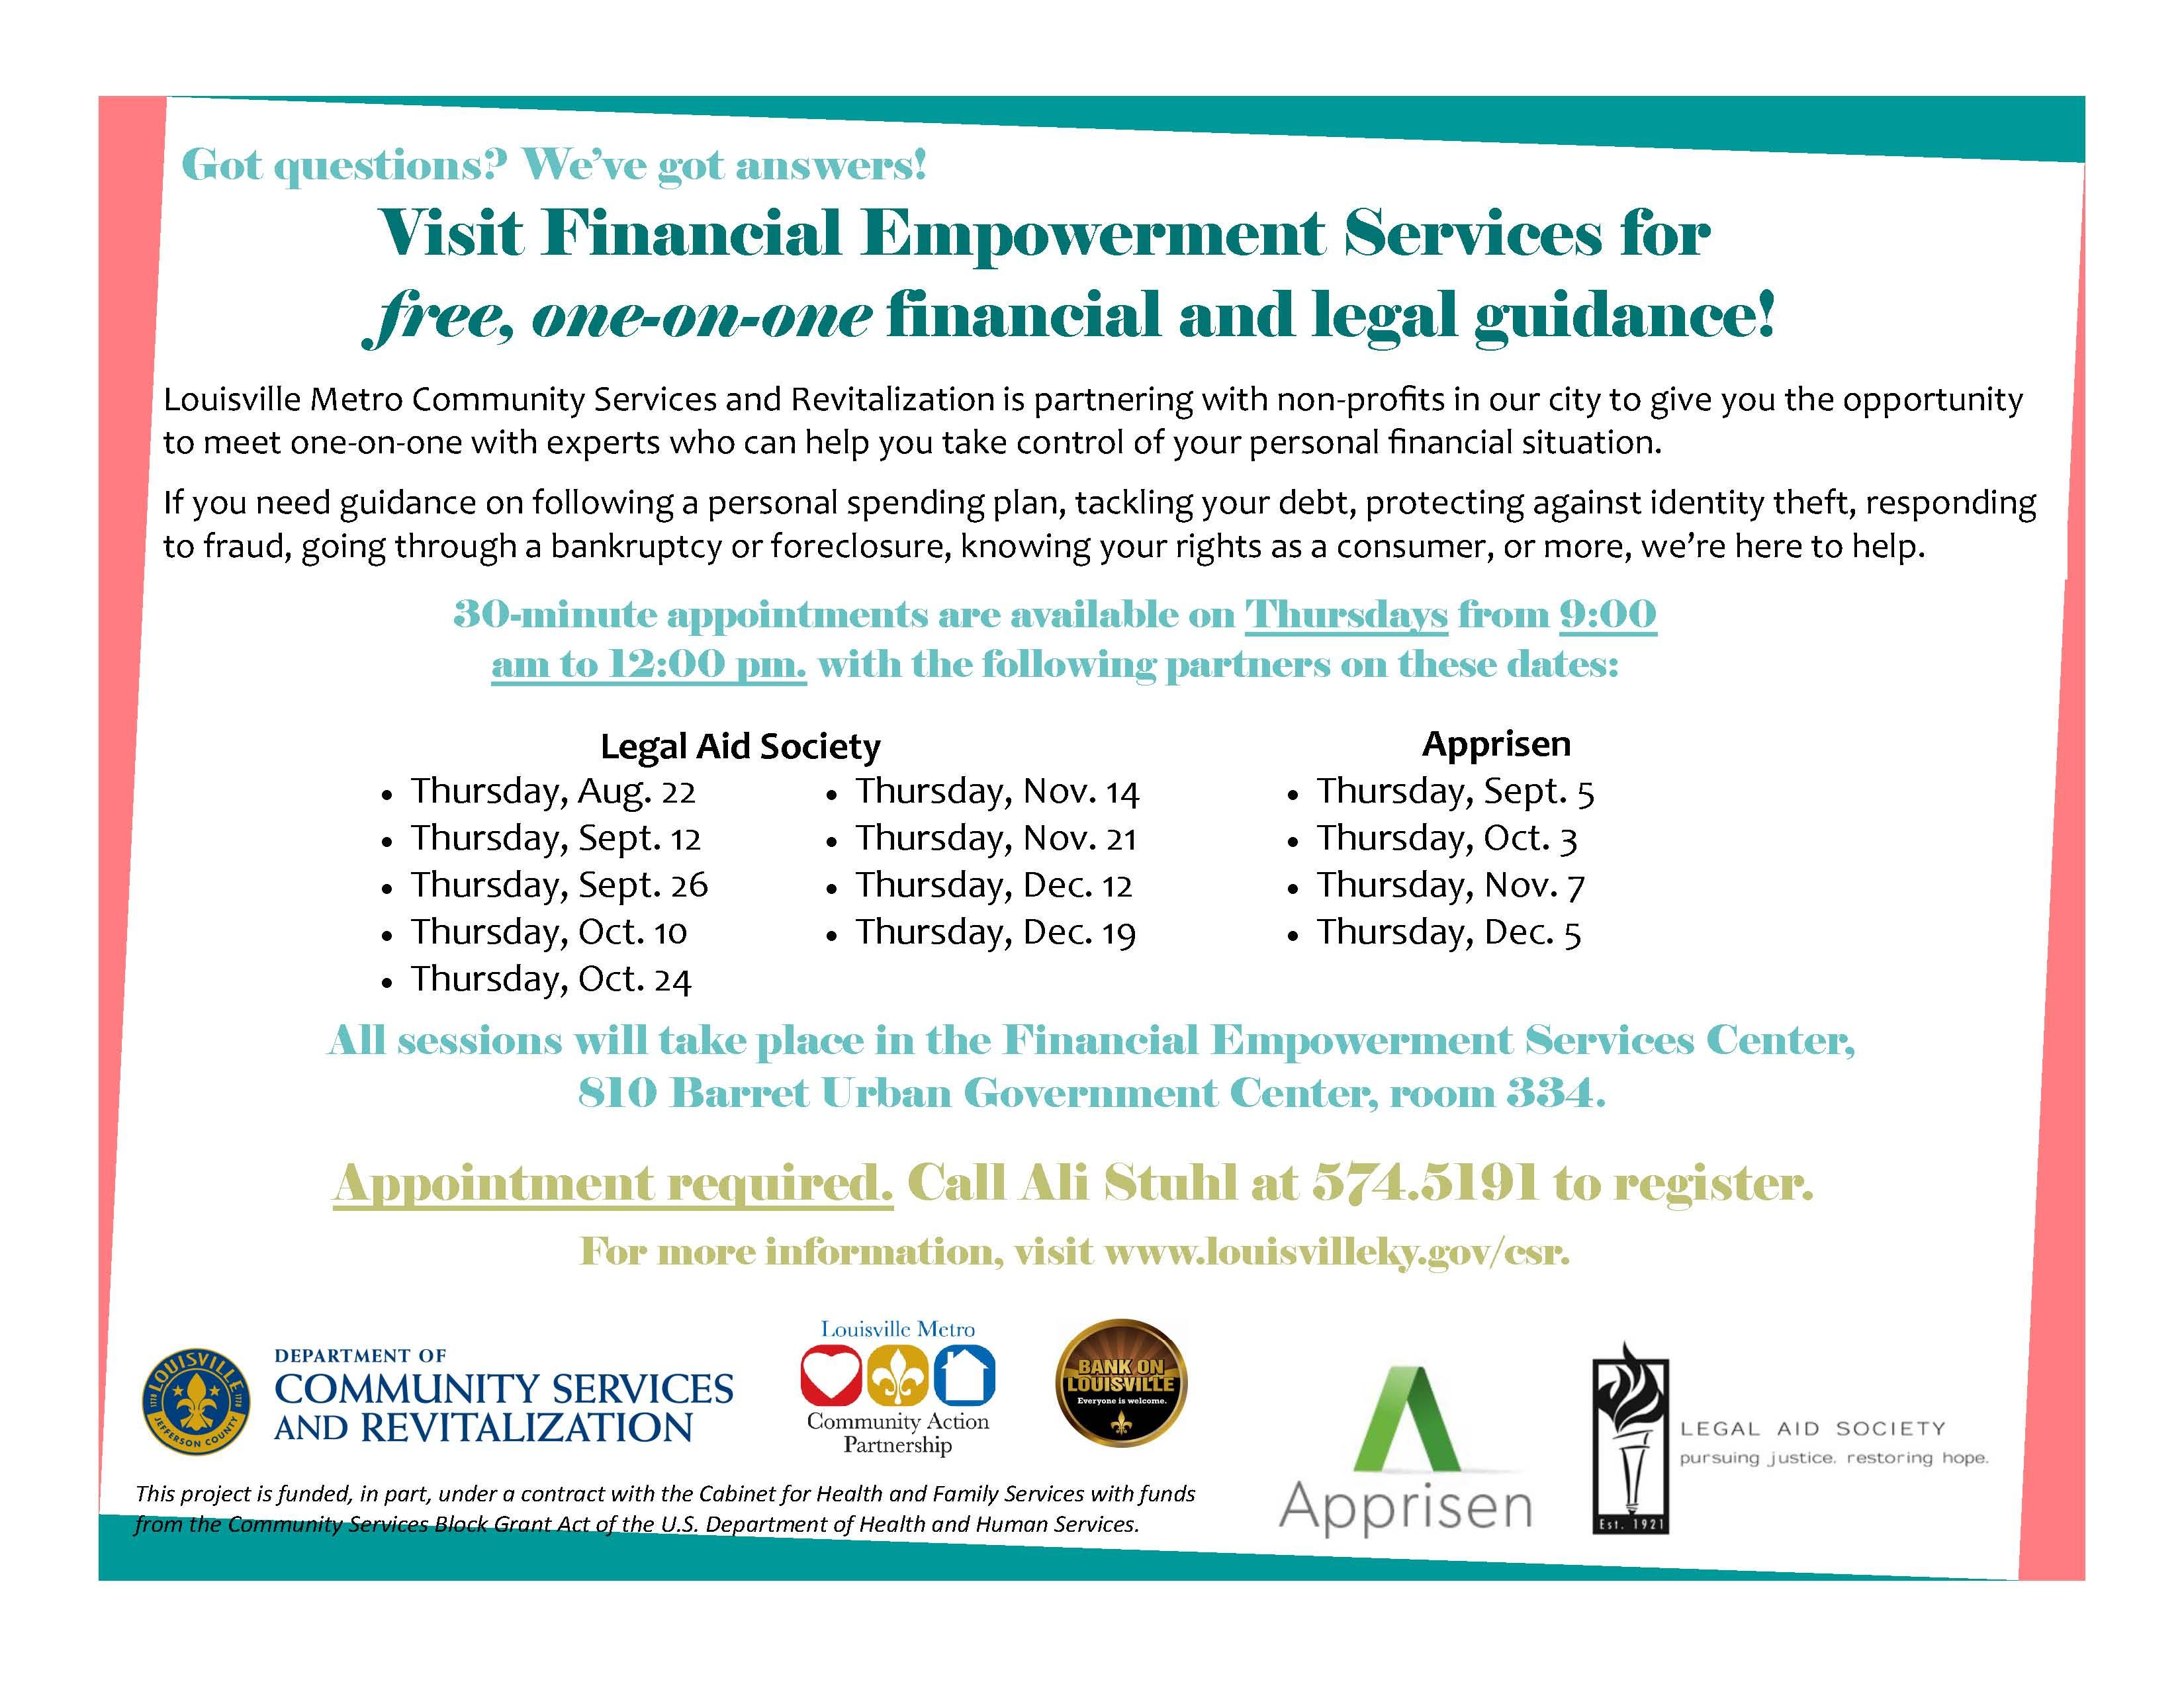 FinancialEmpowermentServicesflyer (2)